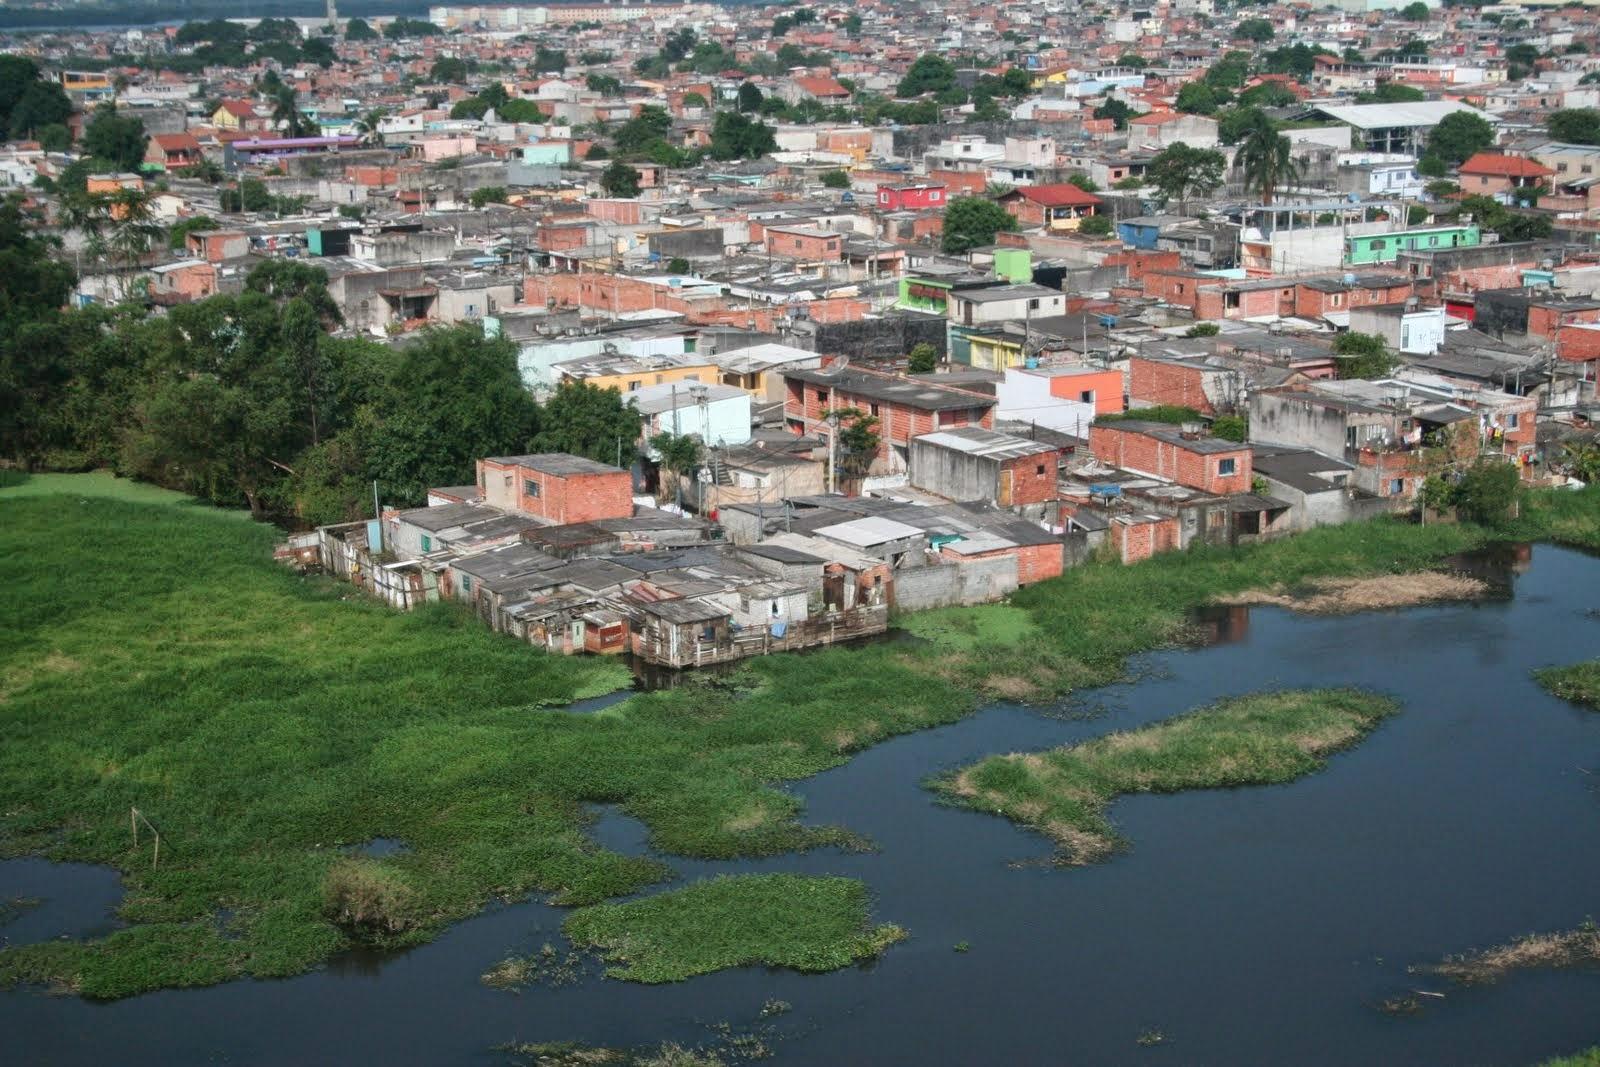 Foto Jardim Pantanal, bairro da zona leste de SP, que ocupa as